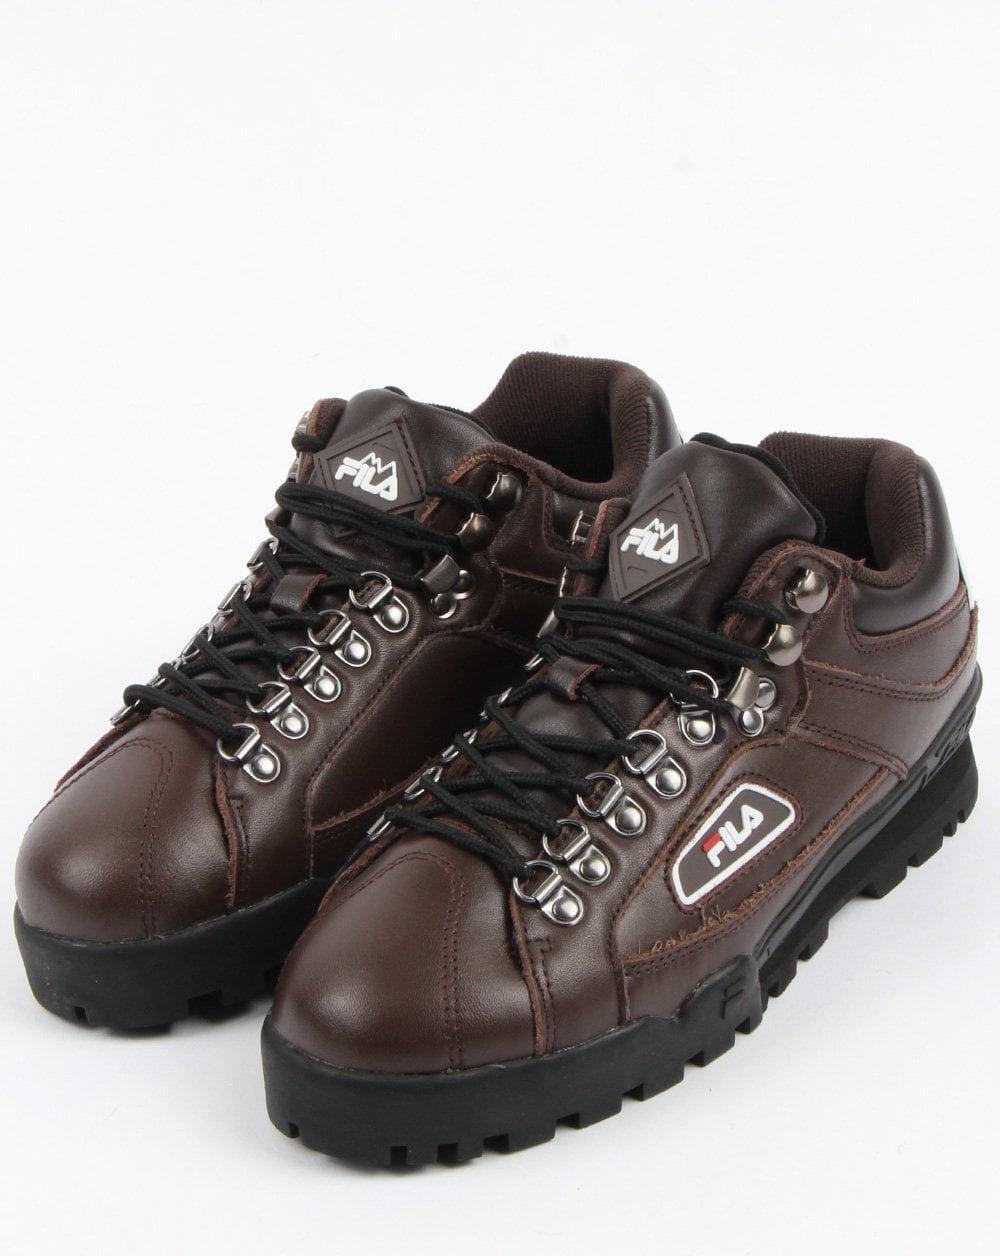 becb94f1de3 Fila Vintage Trailblazer Hiking Boots Brown | 80s casual classics